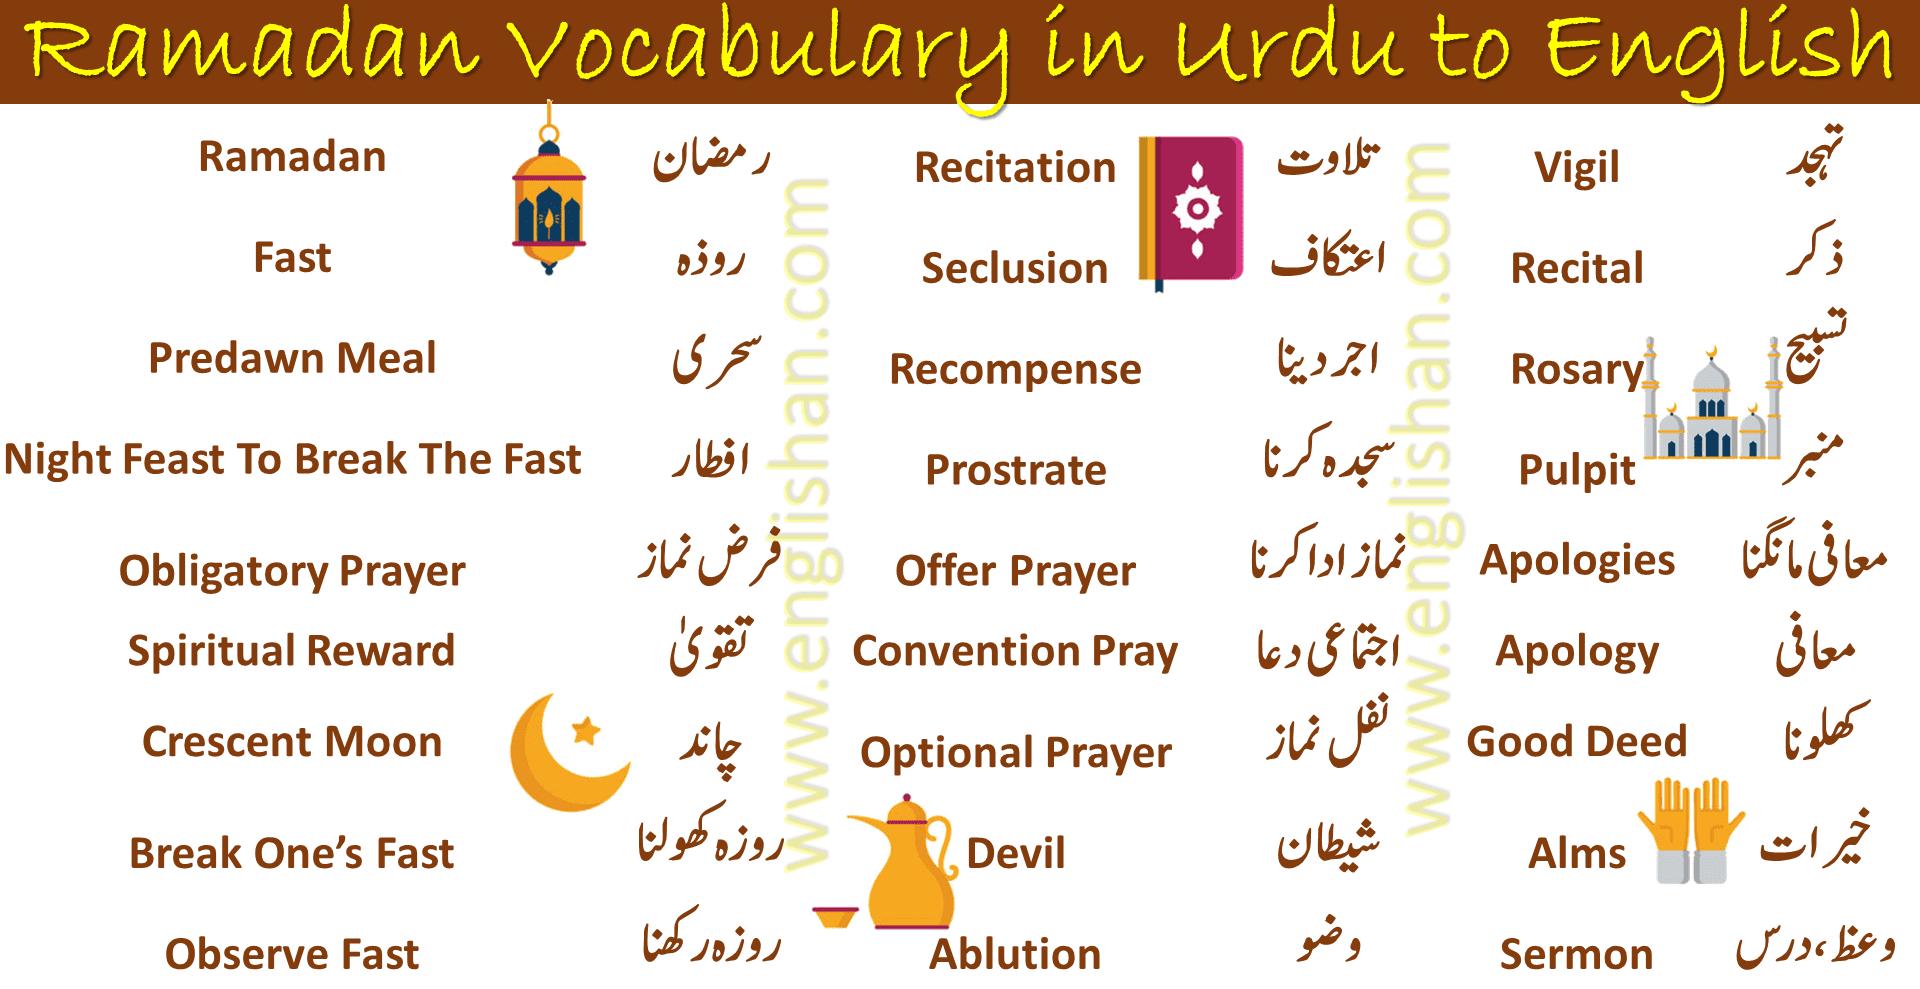 Ramadan Vocabulary in Urdu to English